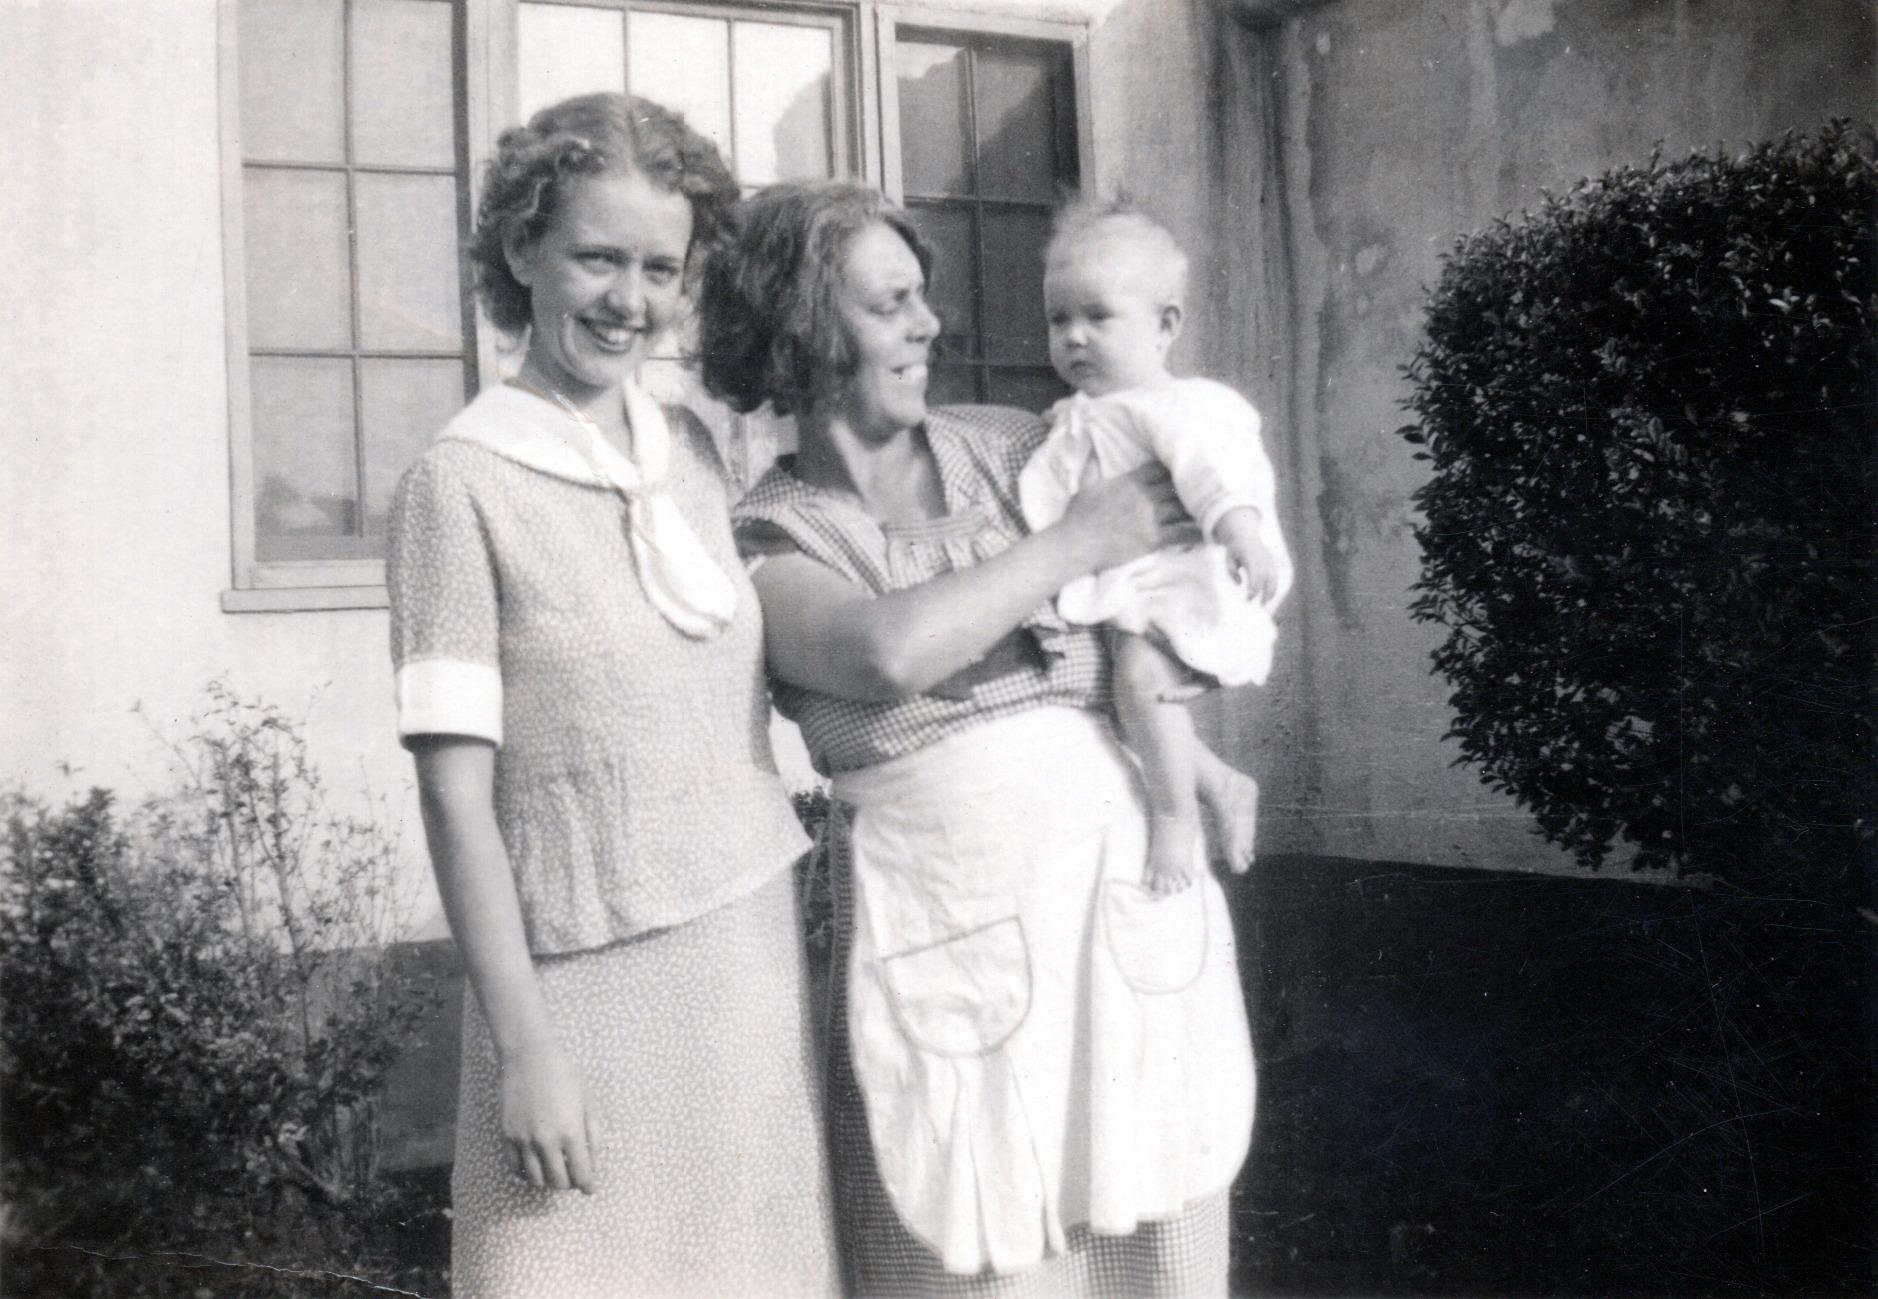 Shirley, Viola & Darlene - 1936